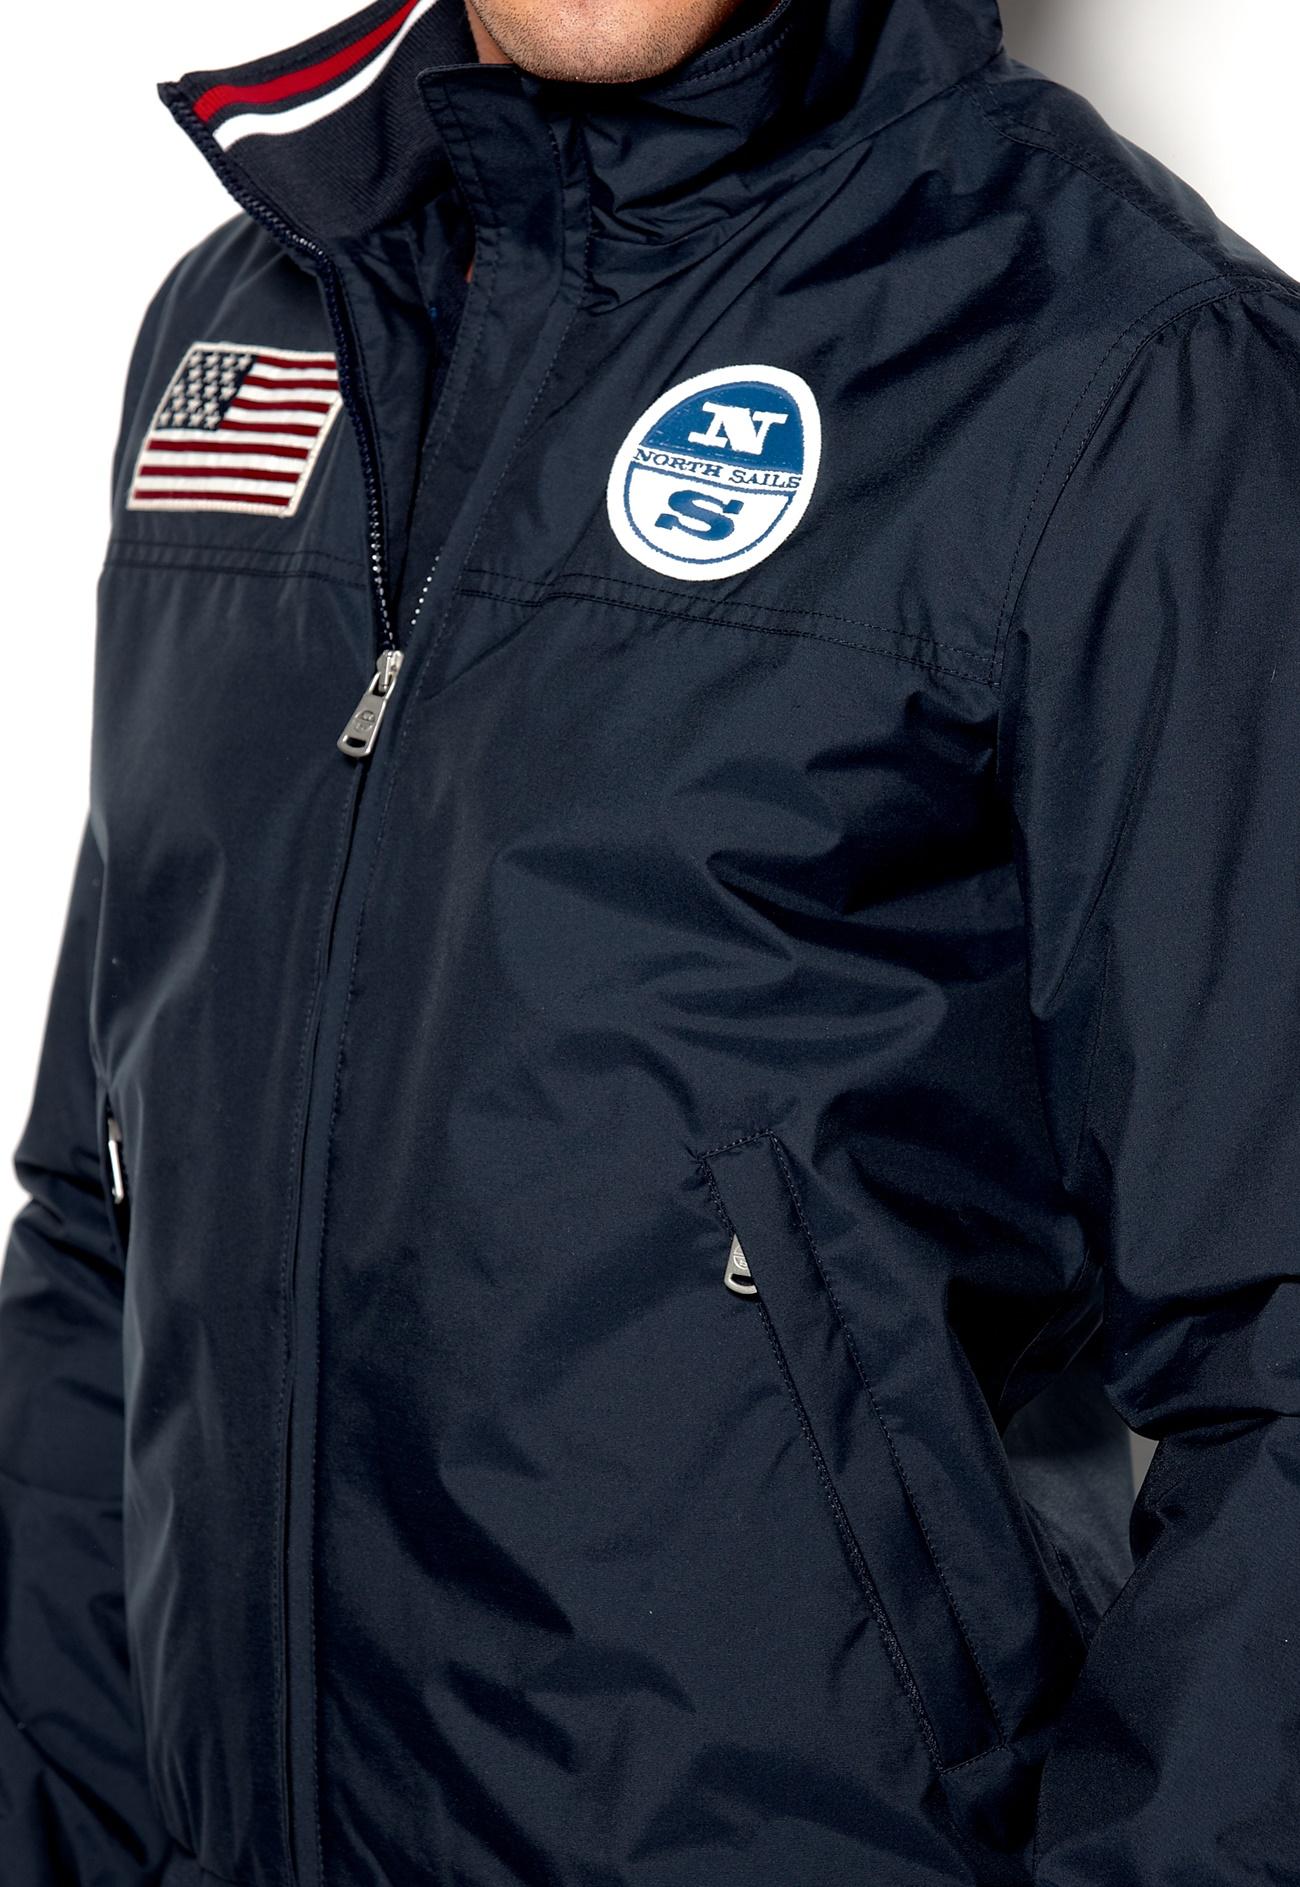 north sails sail team jacket bluoltremaro bubbleroom. Black Bedroom Furniture Sets. Home Design Ideas